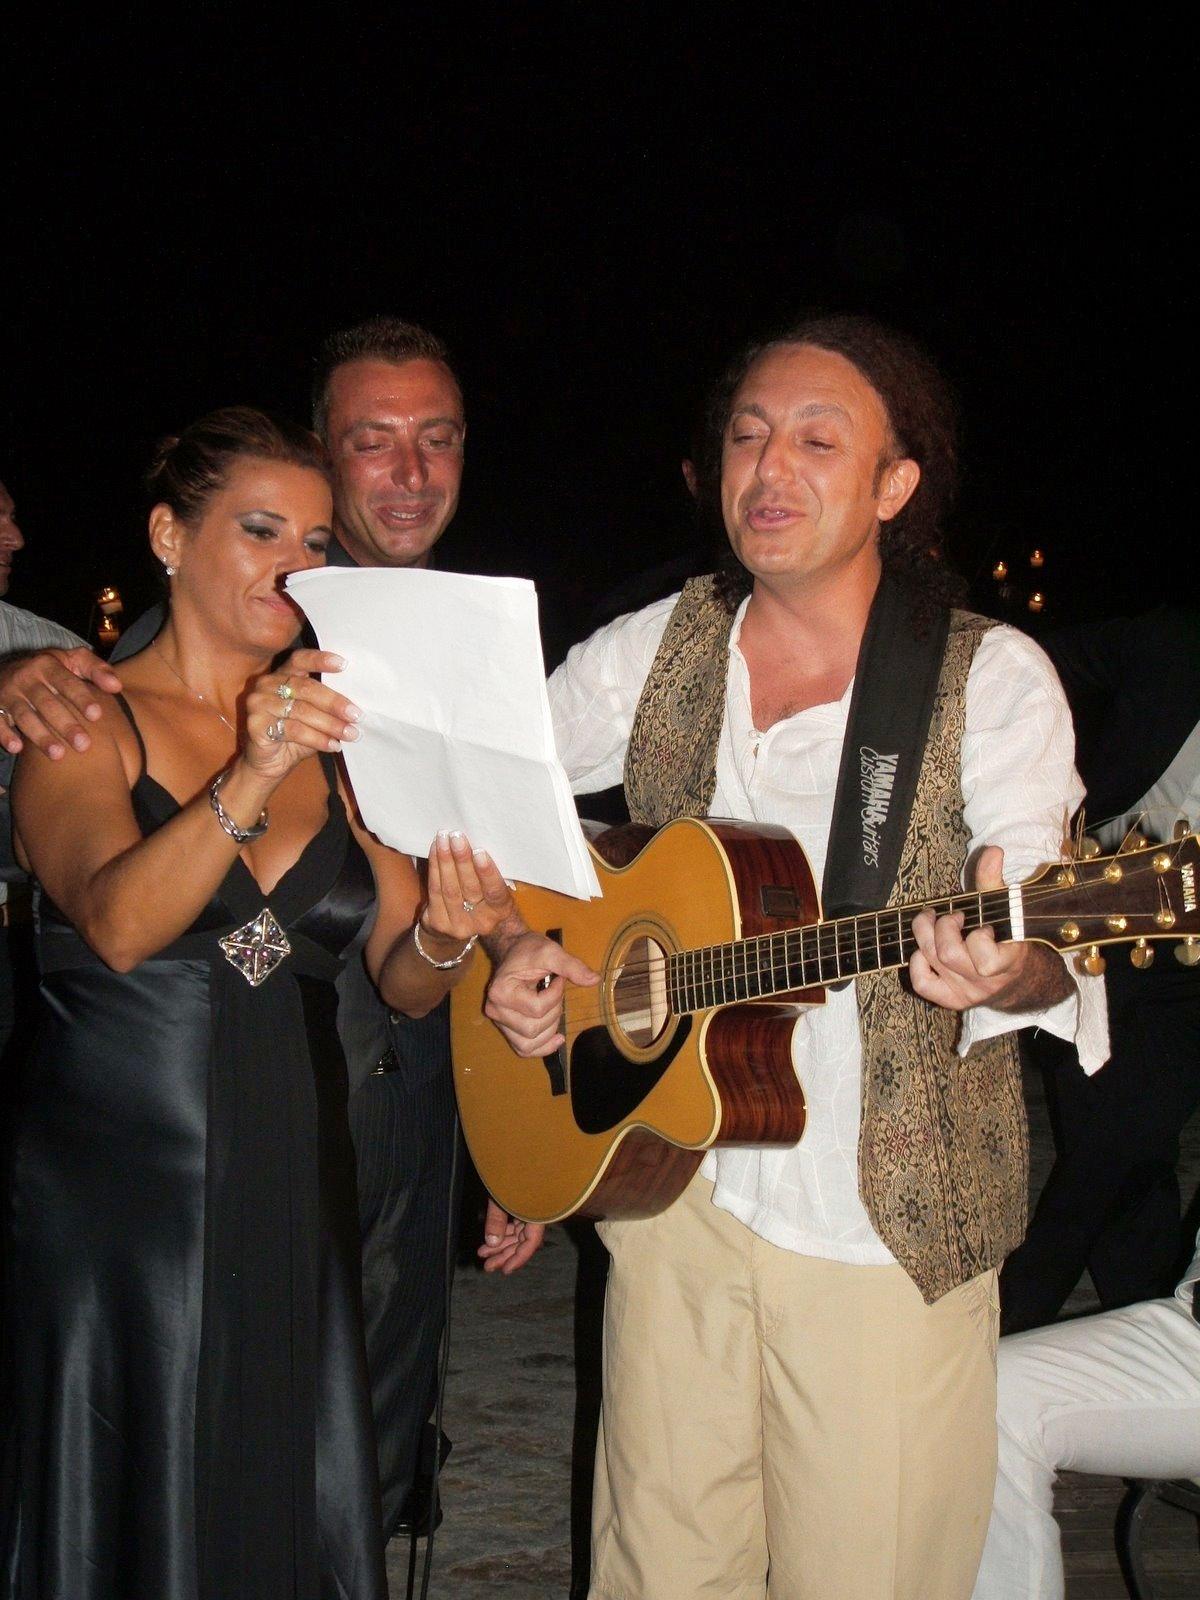 Atlantis Bay Taormina - Matrimonio Giuseppe e Graziella Giuffrida - Taormina